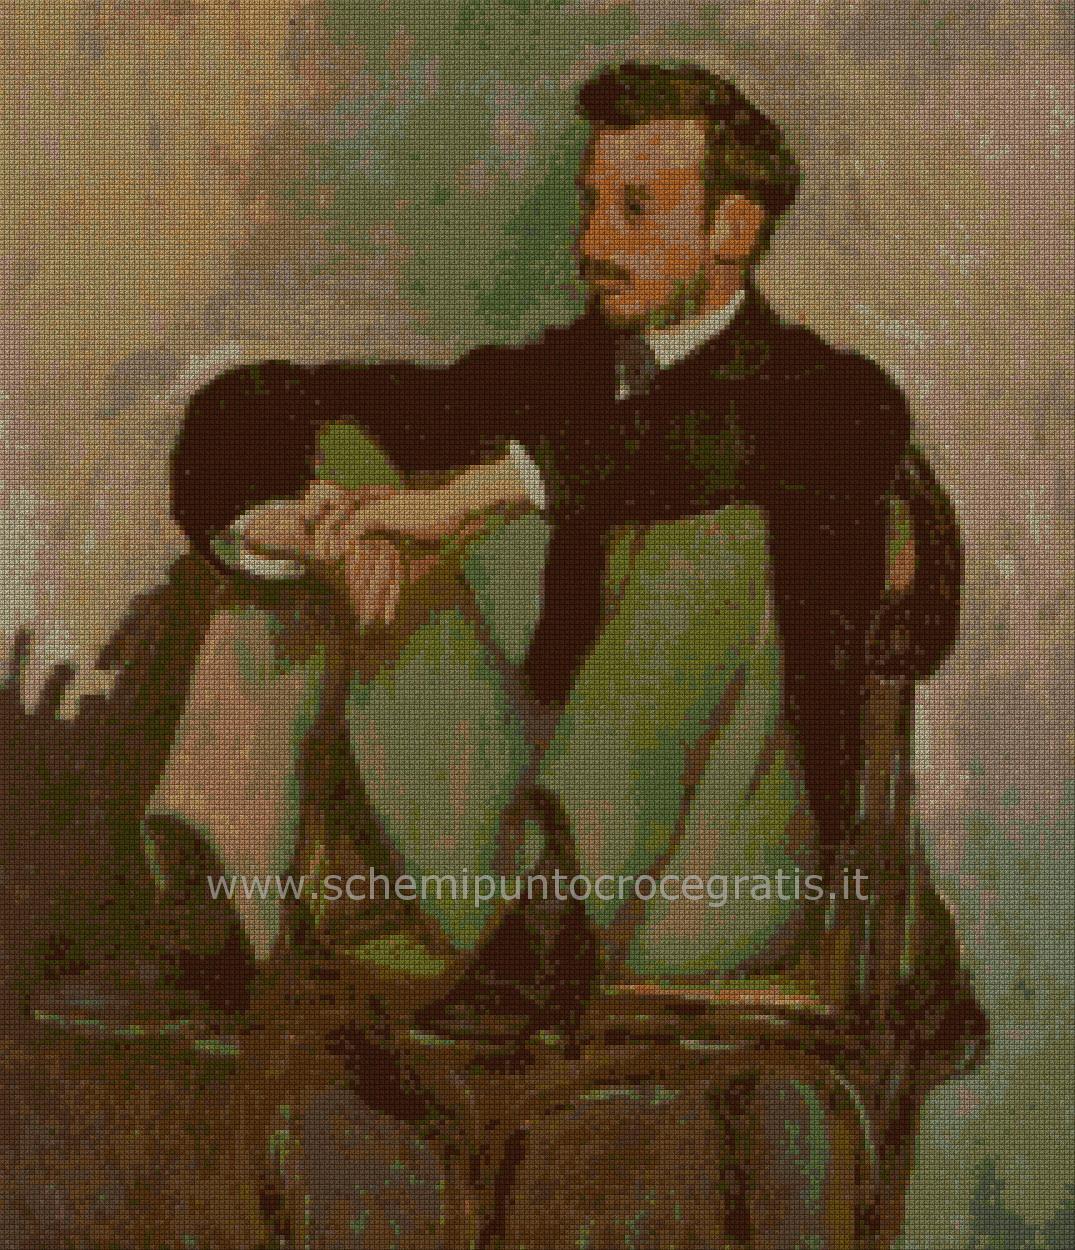 pittori_moderni/renoir/Renoir08.jpg